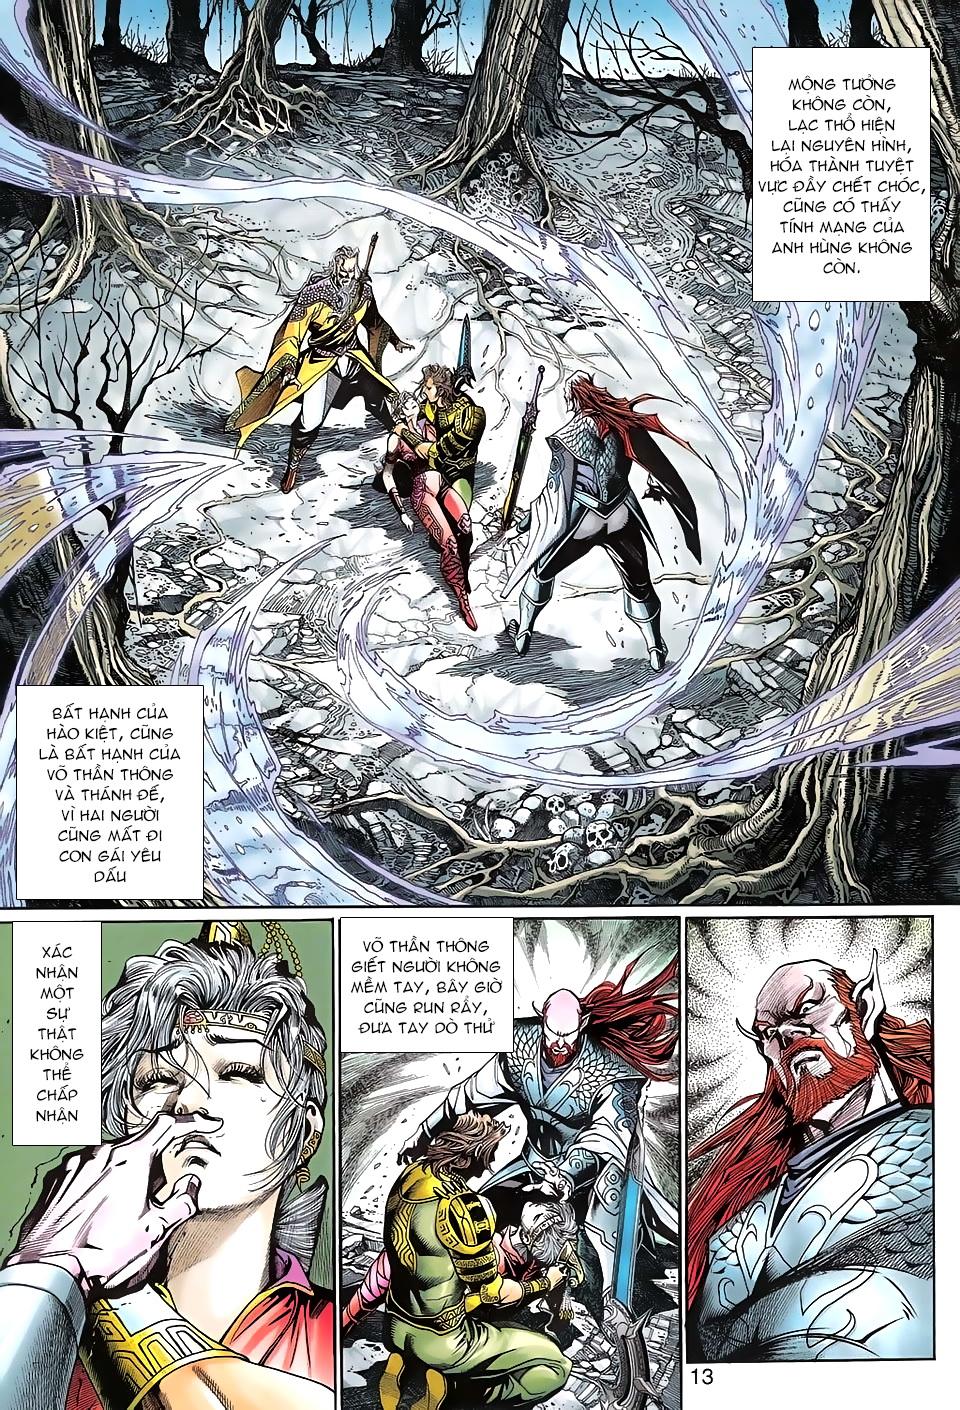 Thần binh huyền kỳ 3 - 3.5 Chapter 91 - Hamtruyen.vn